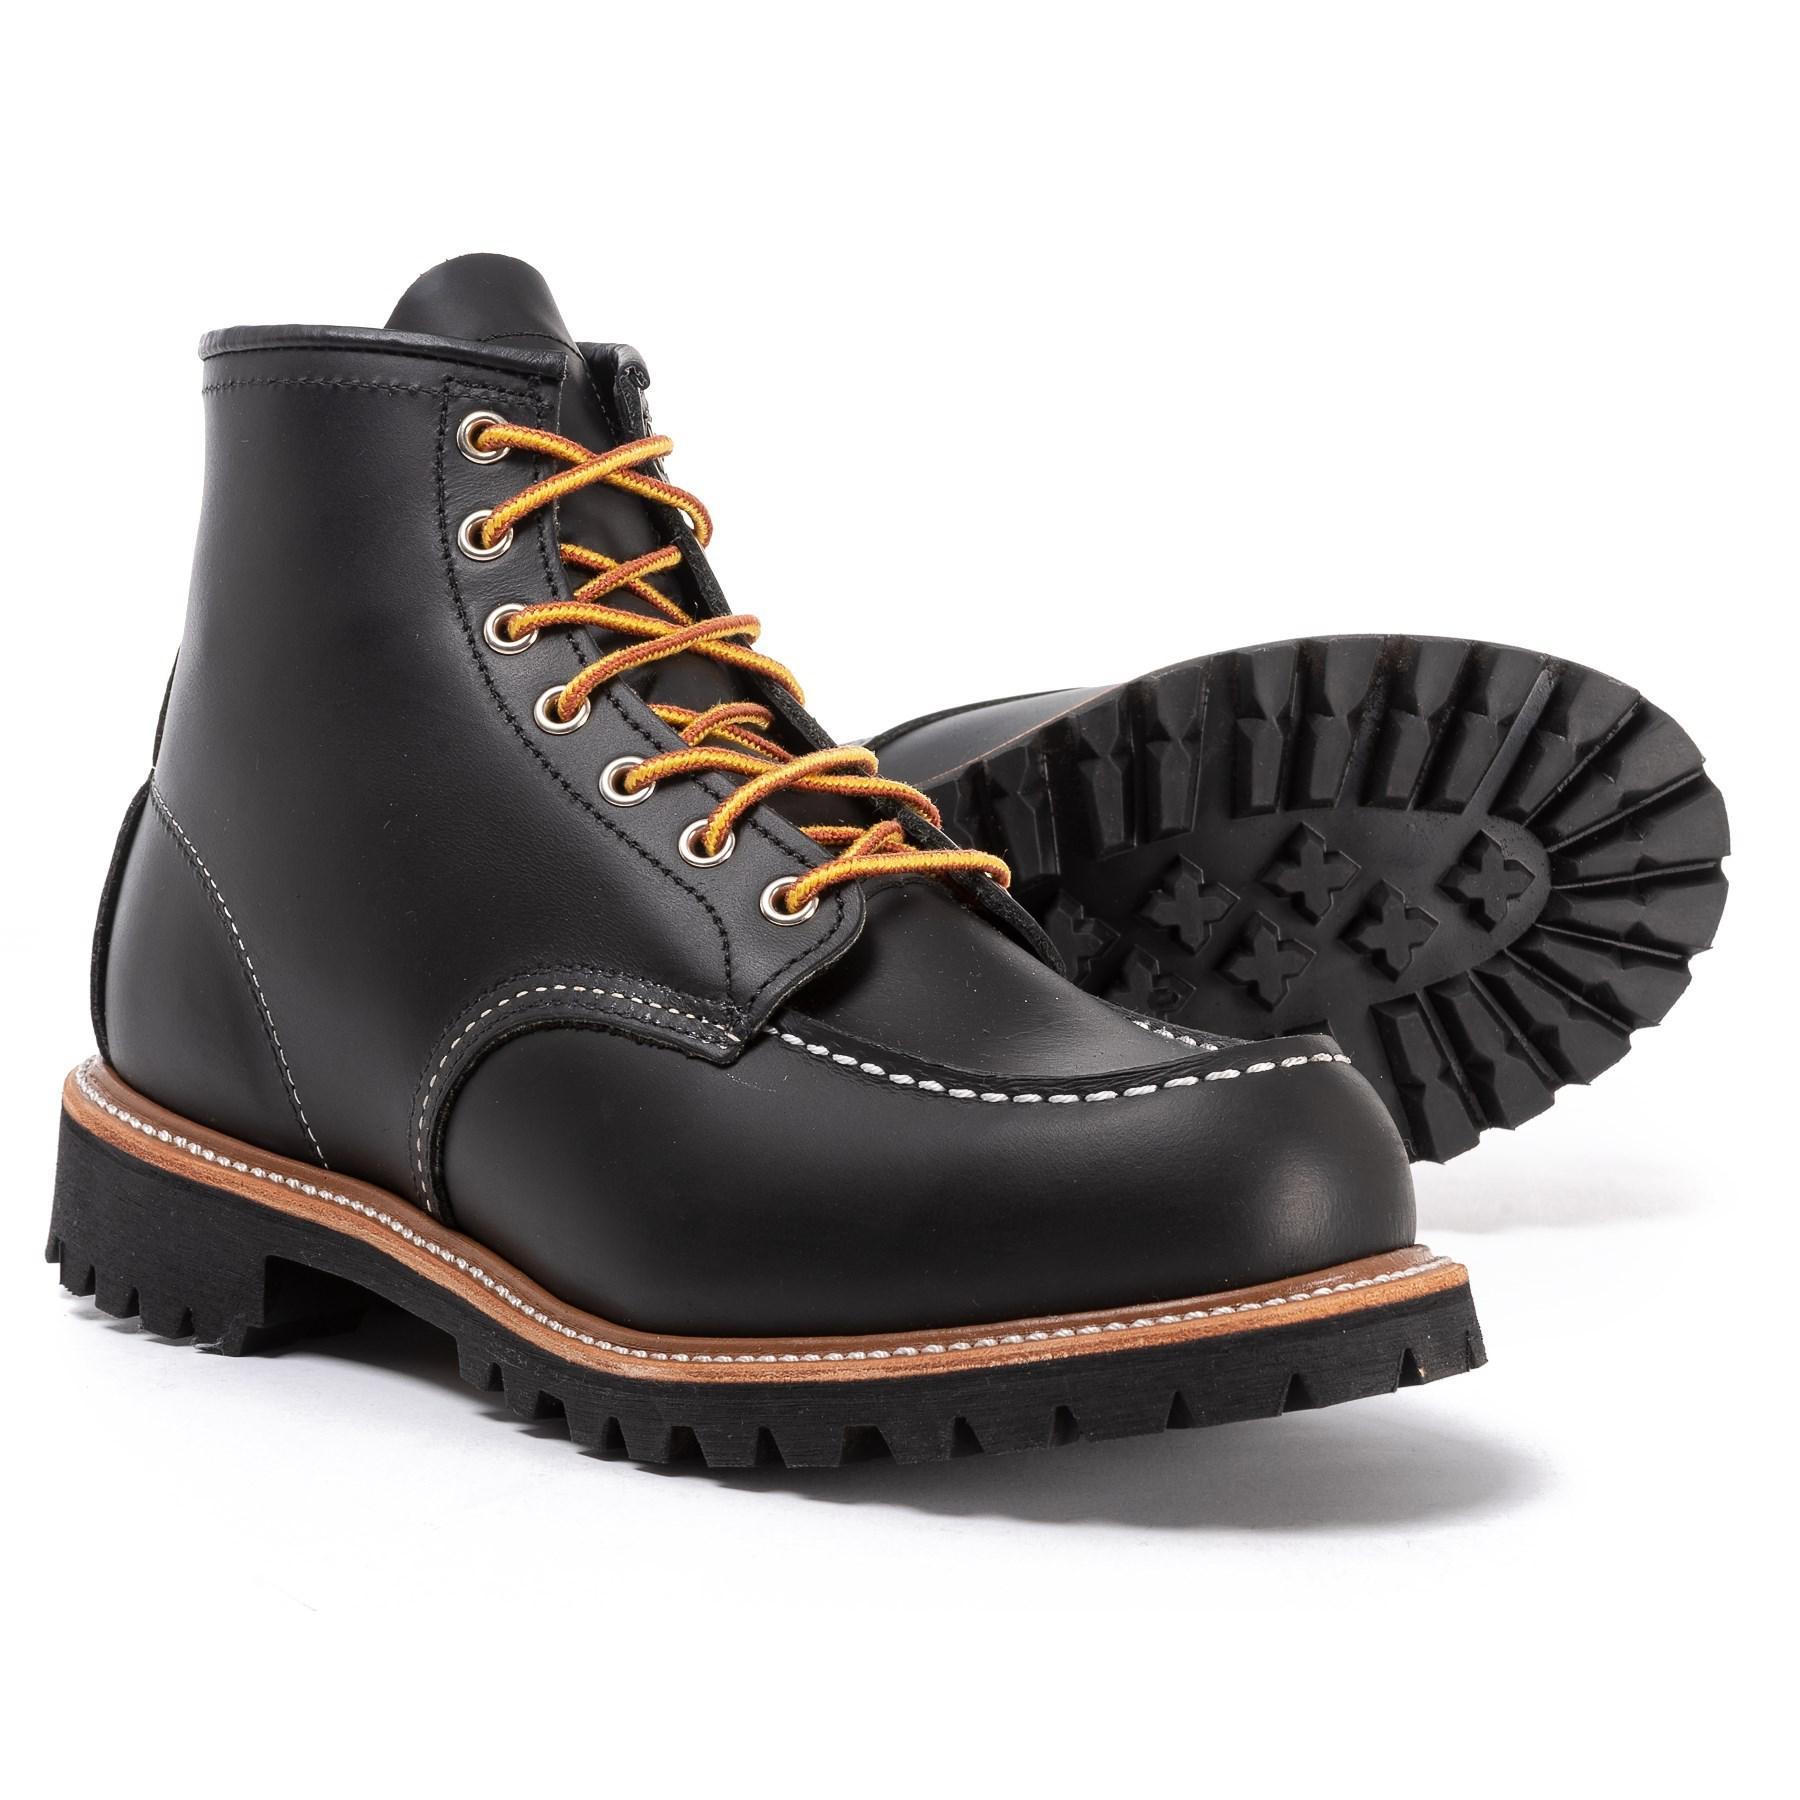 fe9c327e207 Red Wing Black Irish Setter Classic Moc-toe Work Boots for men